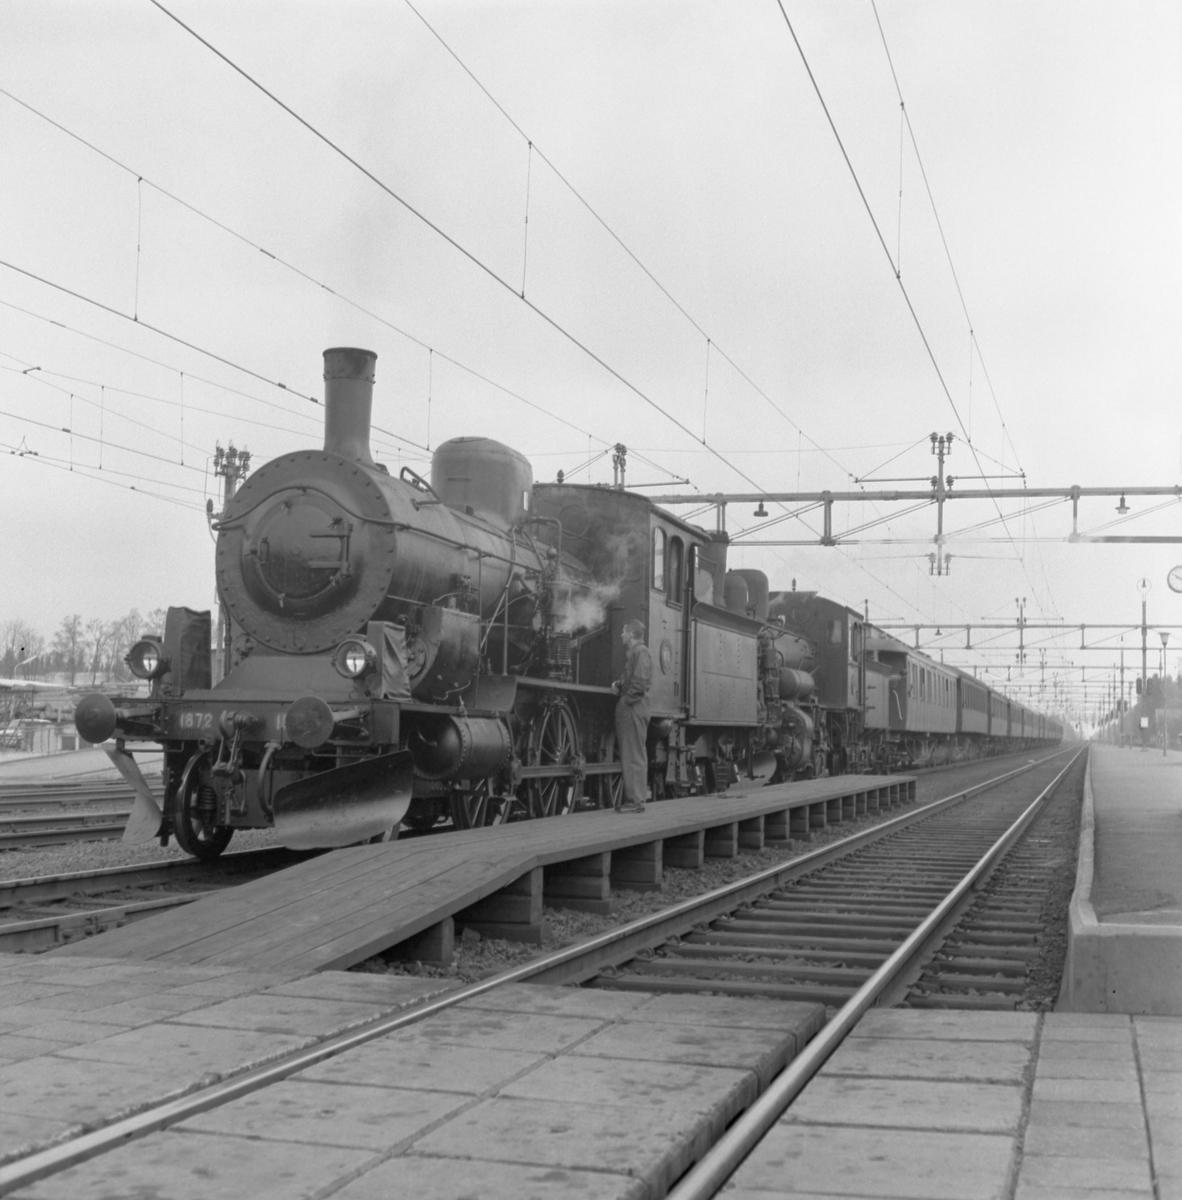 Statens Järnvägar, SJ L16 1872 + Statens Järnvägar, SJ L 818.